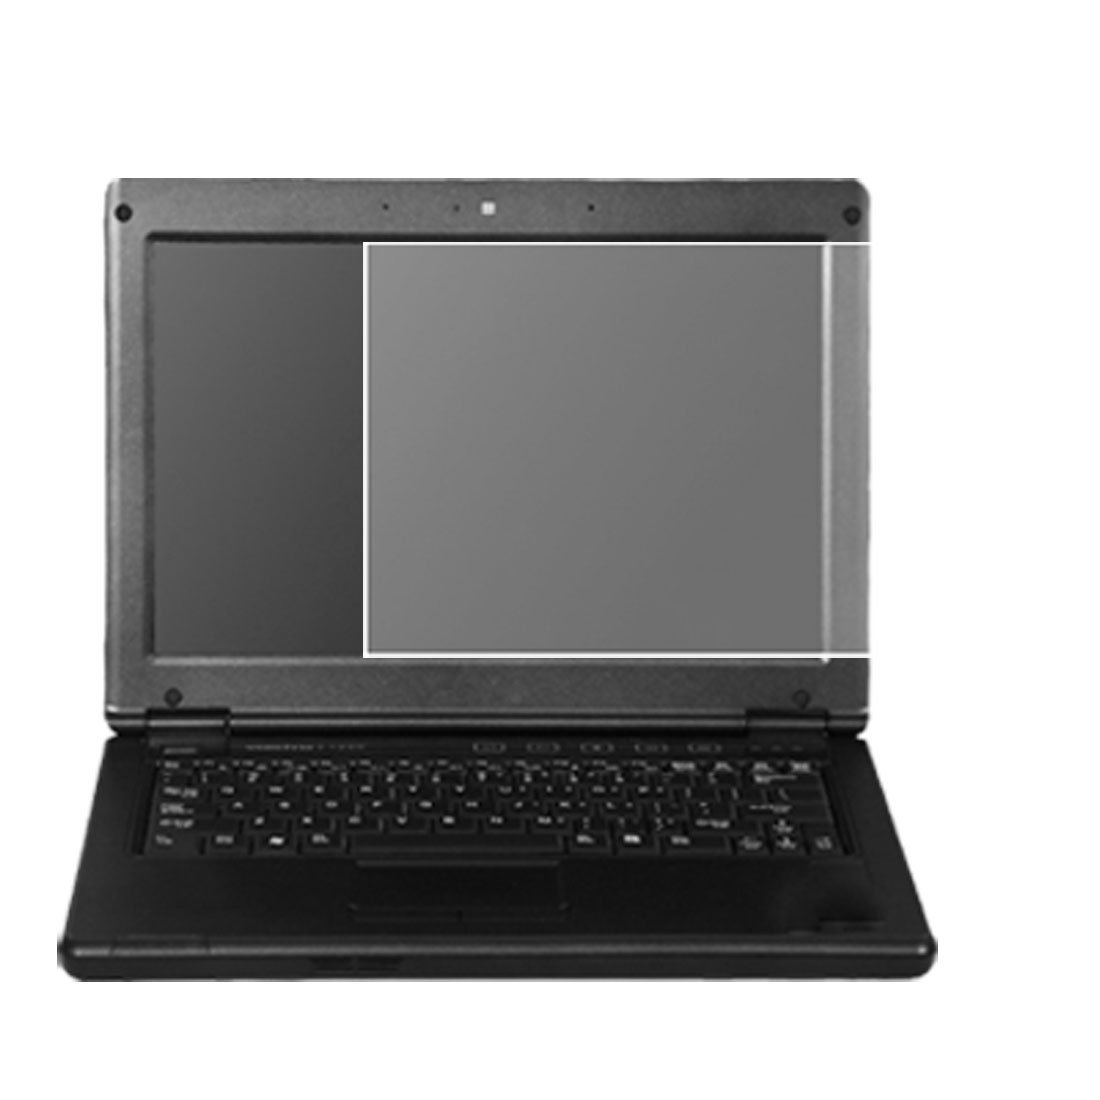 PC Portátil 14.1 Protector de pantalla LCD de plástico transparente